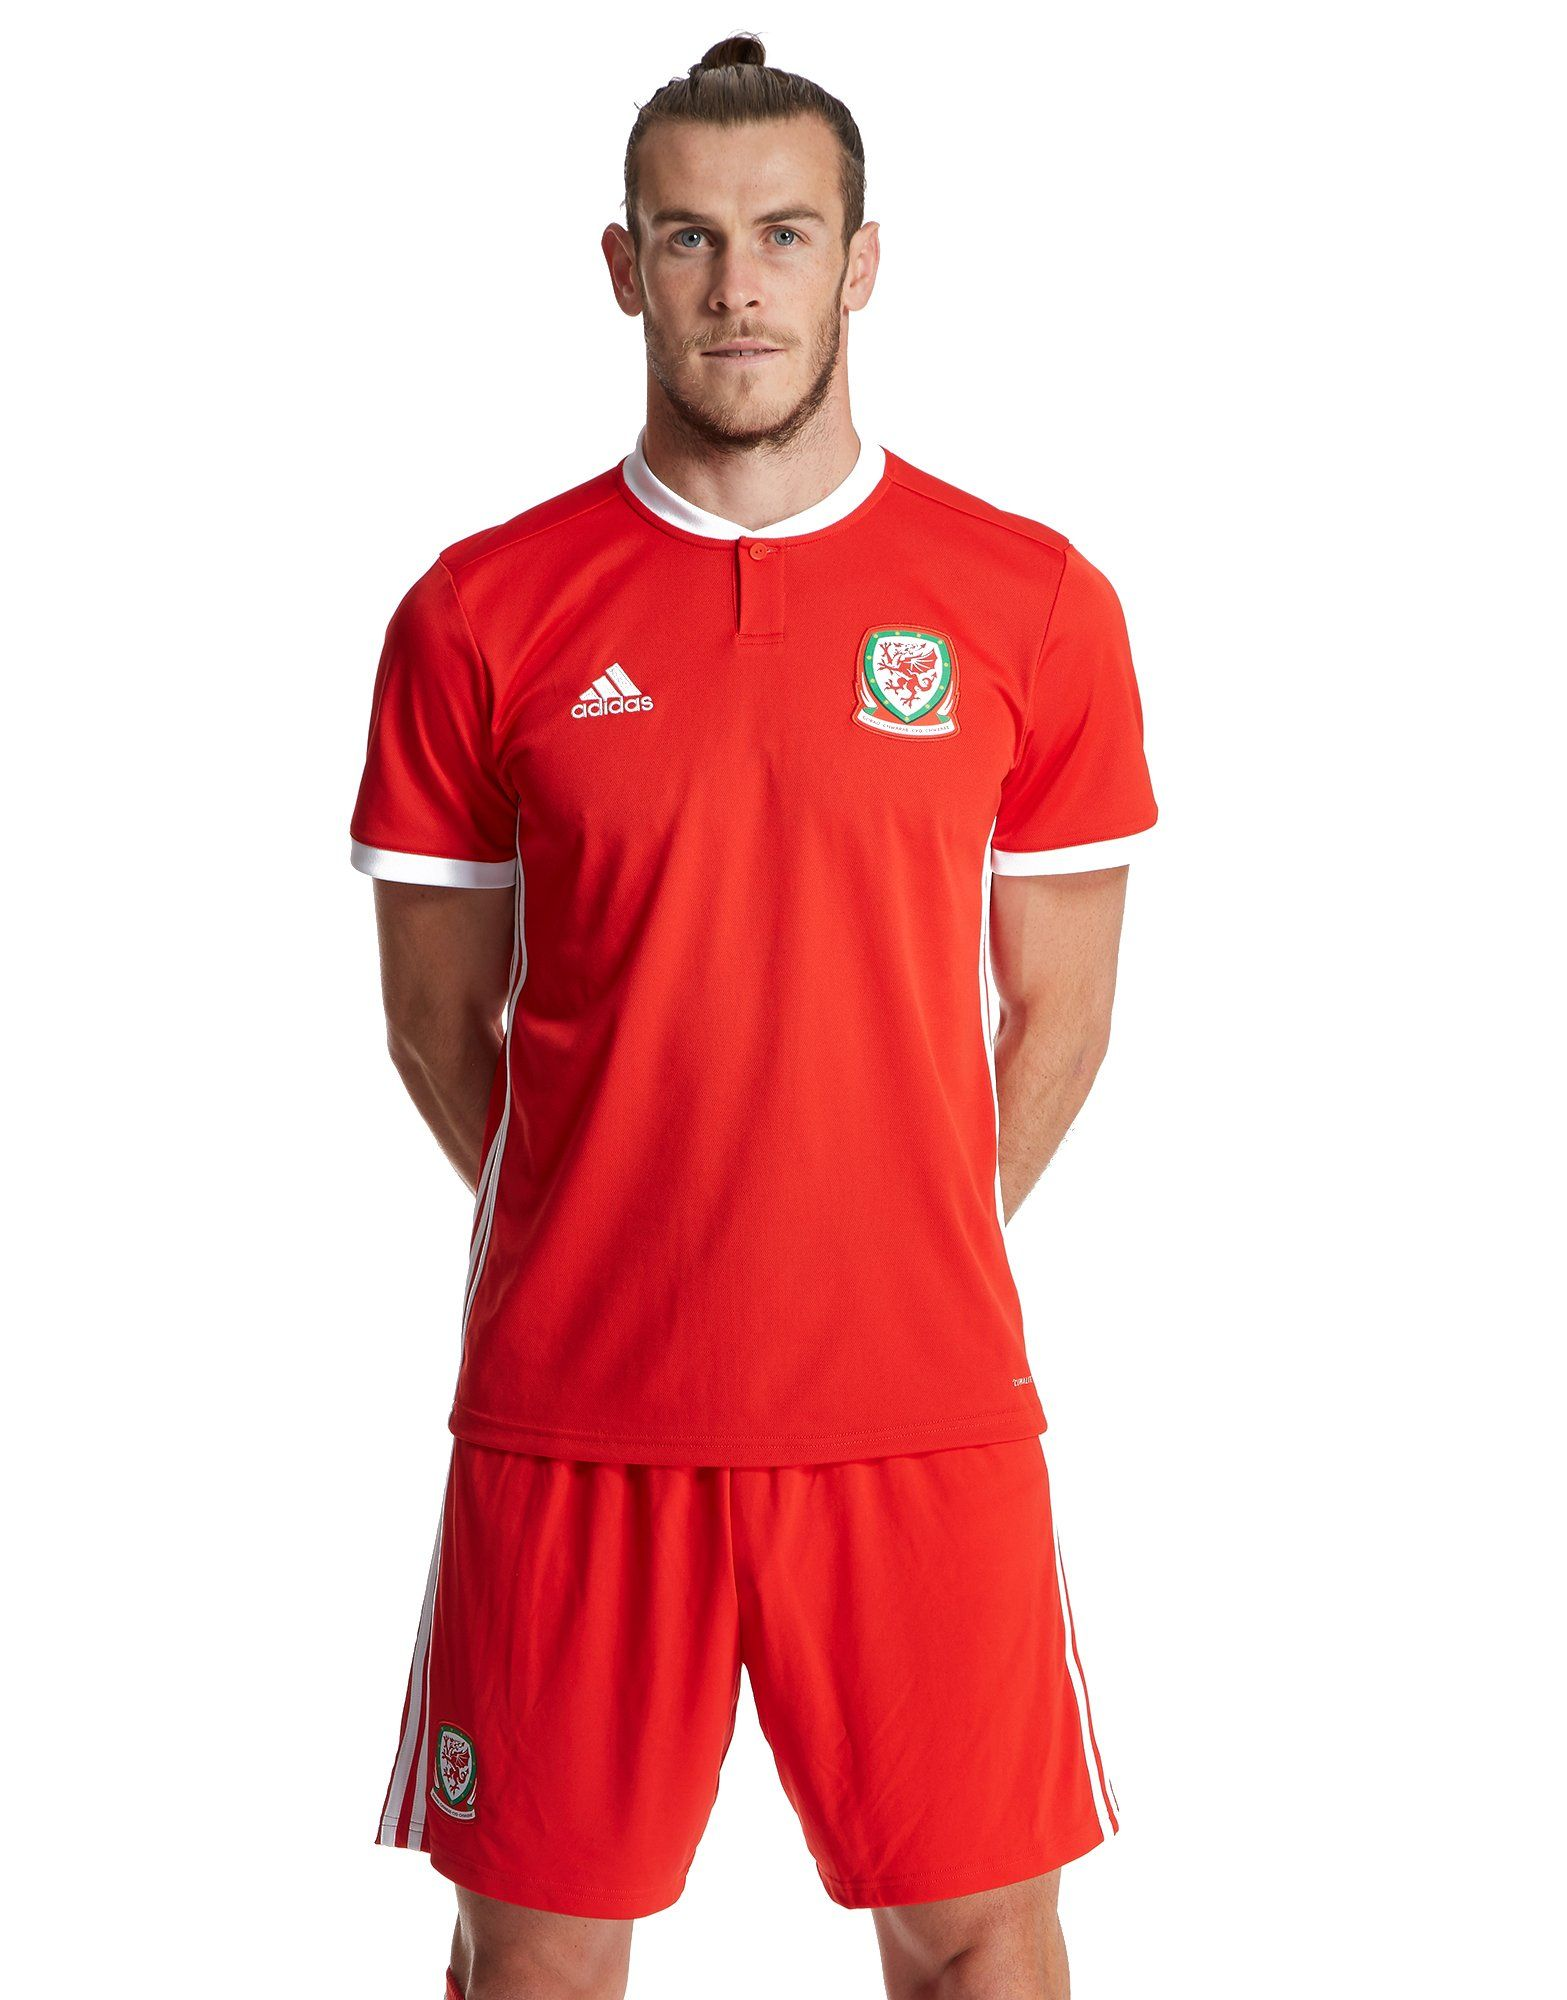 cb19523a4 adidas Wales 2018 19 Home Shirt ...